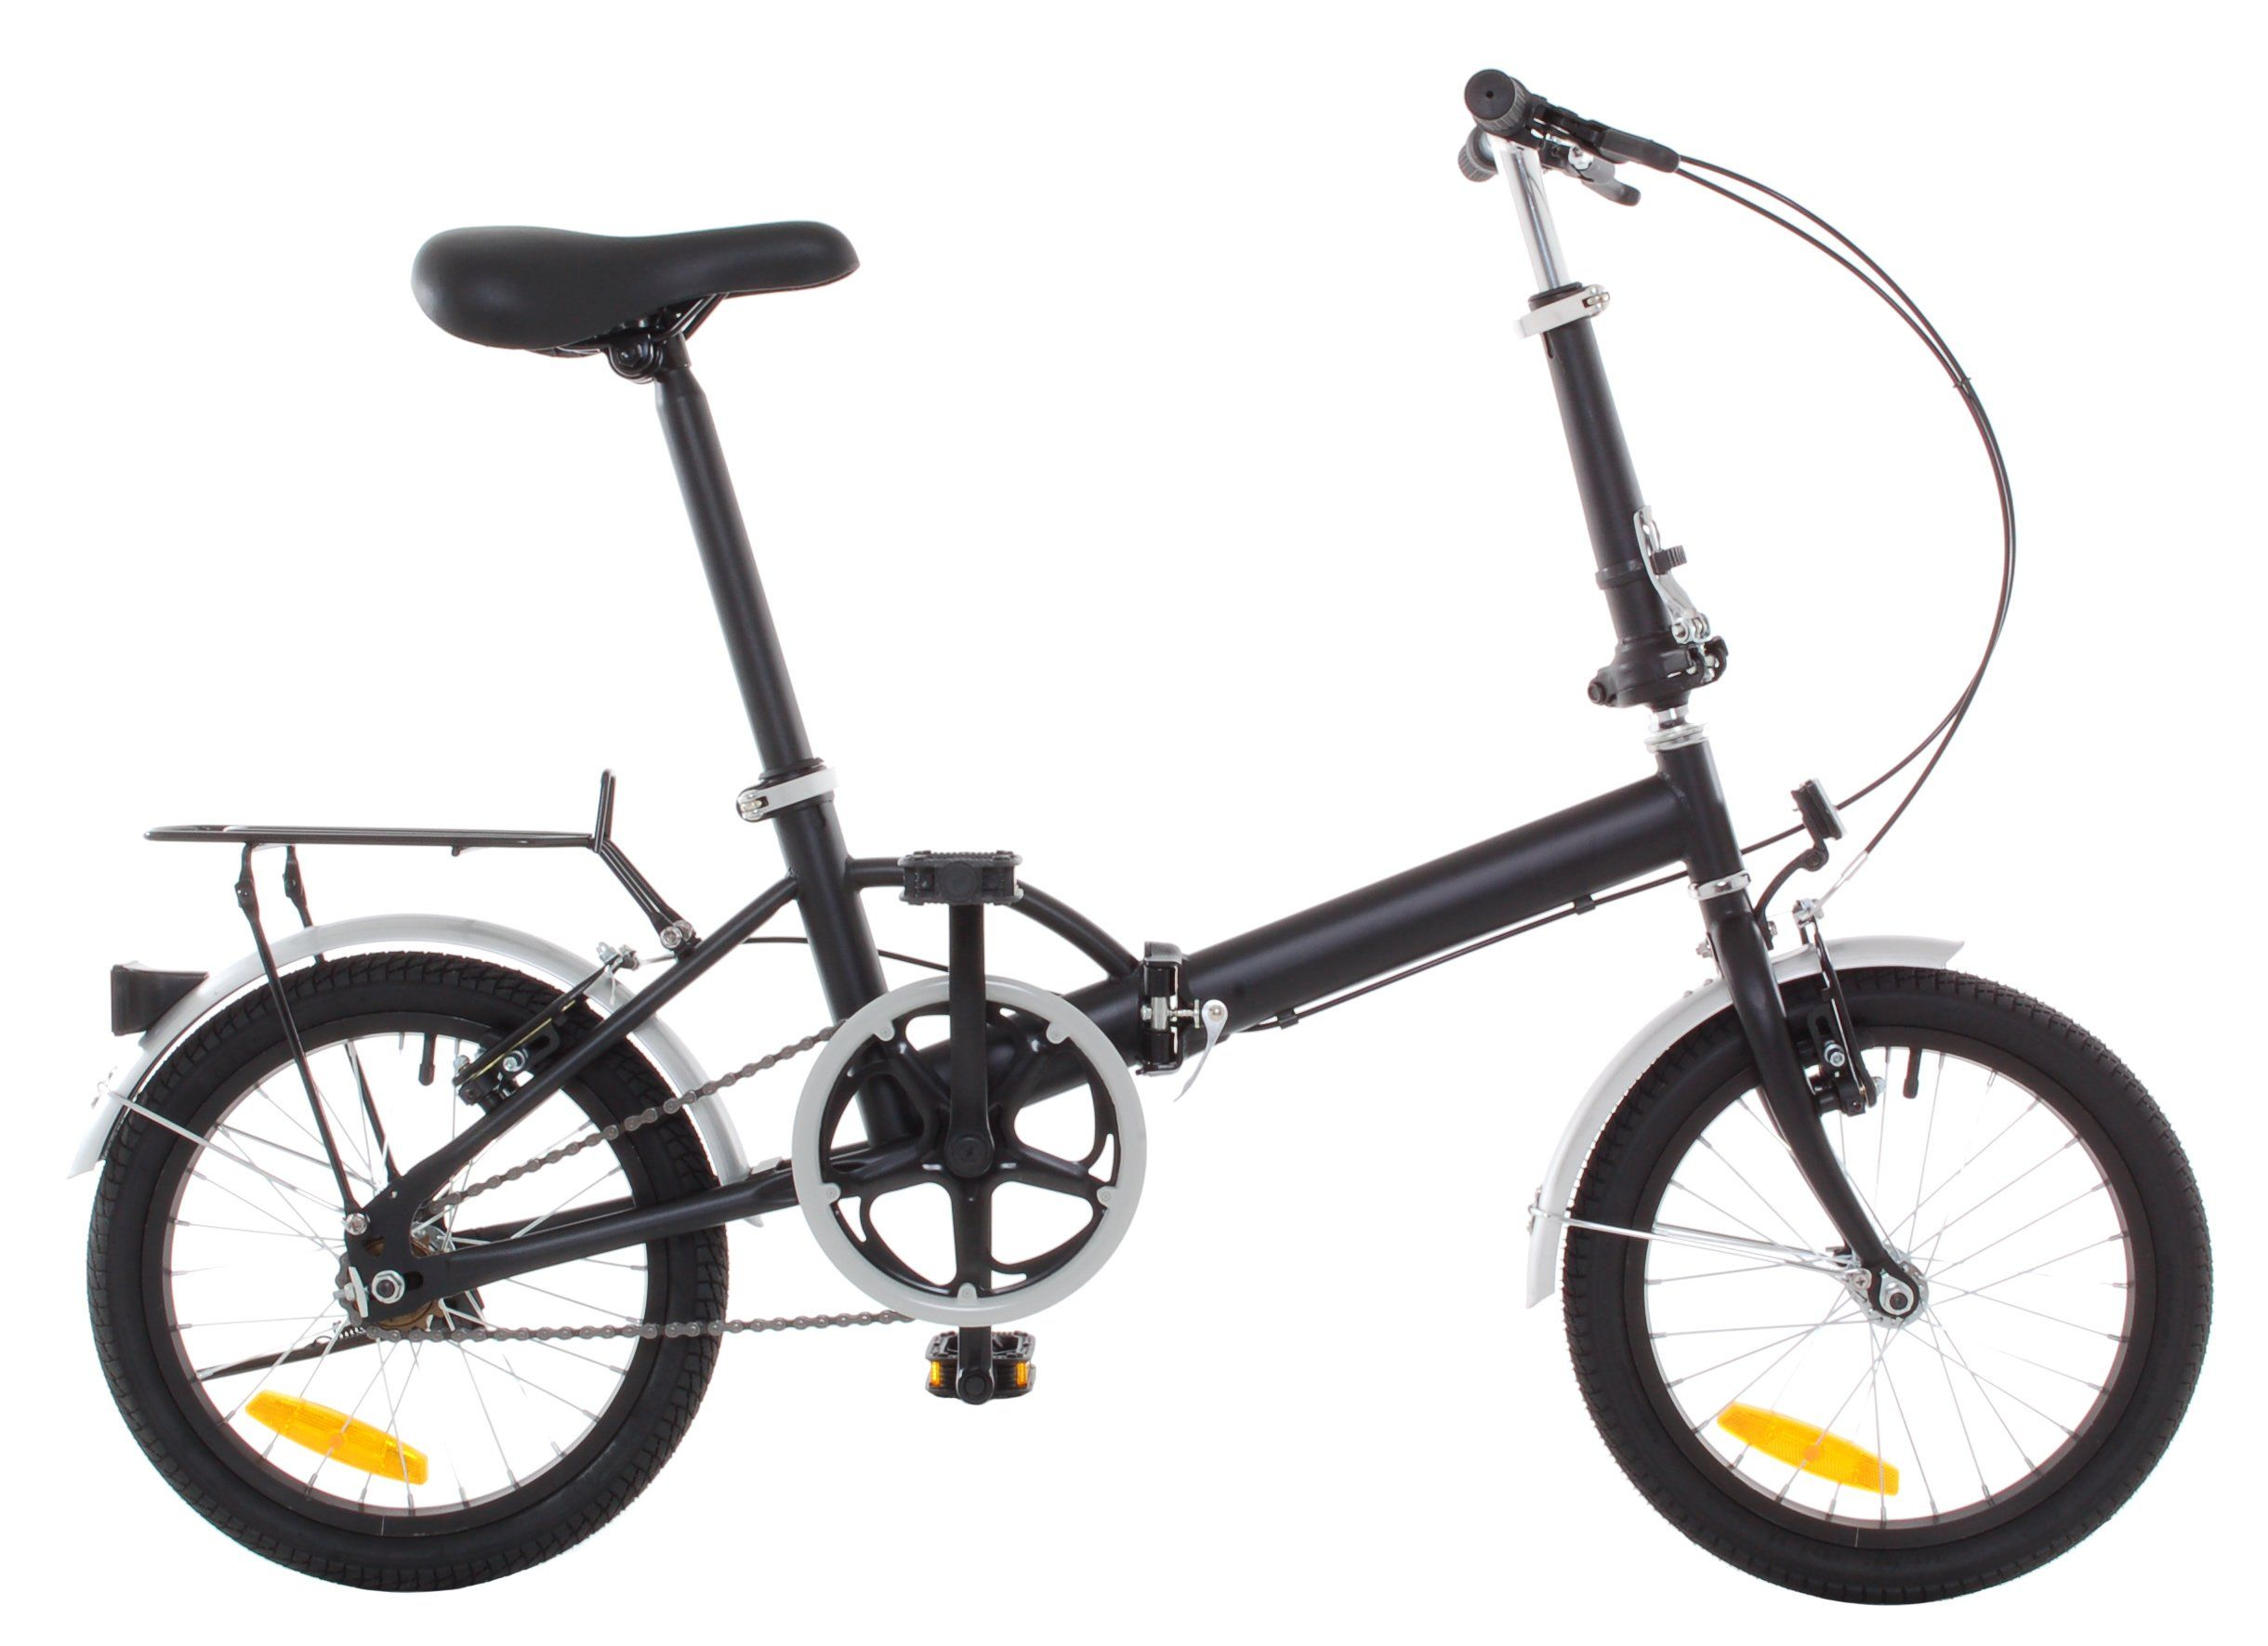 Omega 16 Quot Folding Bicycle Rack Fenders Black Foldable